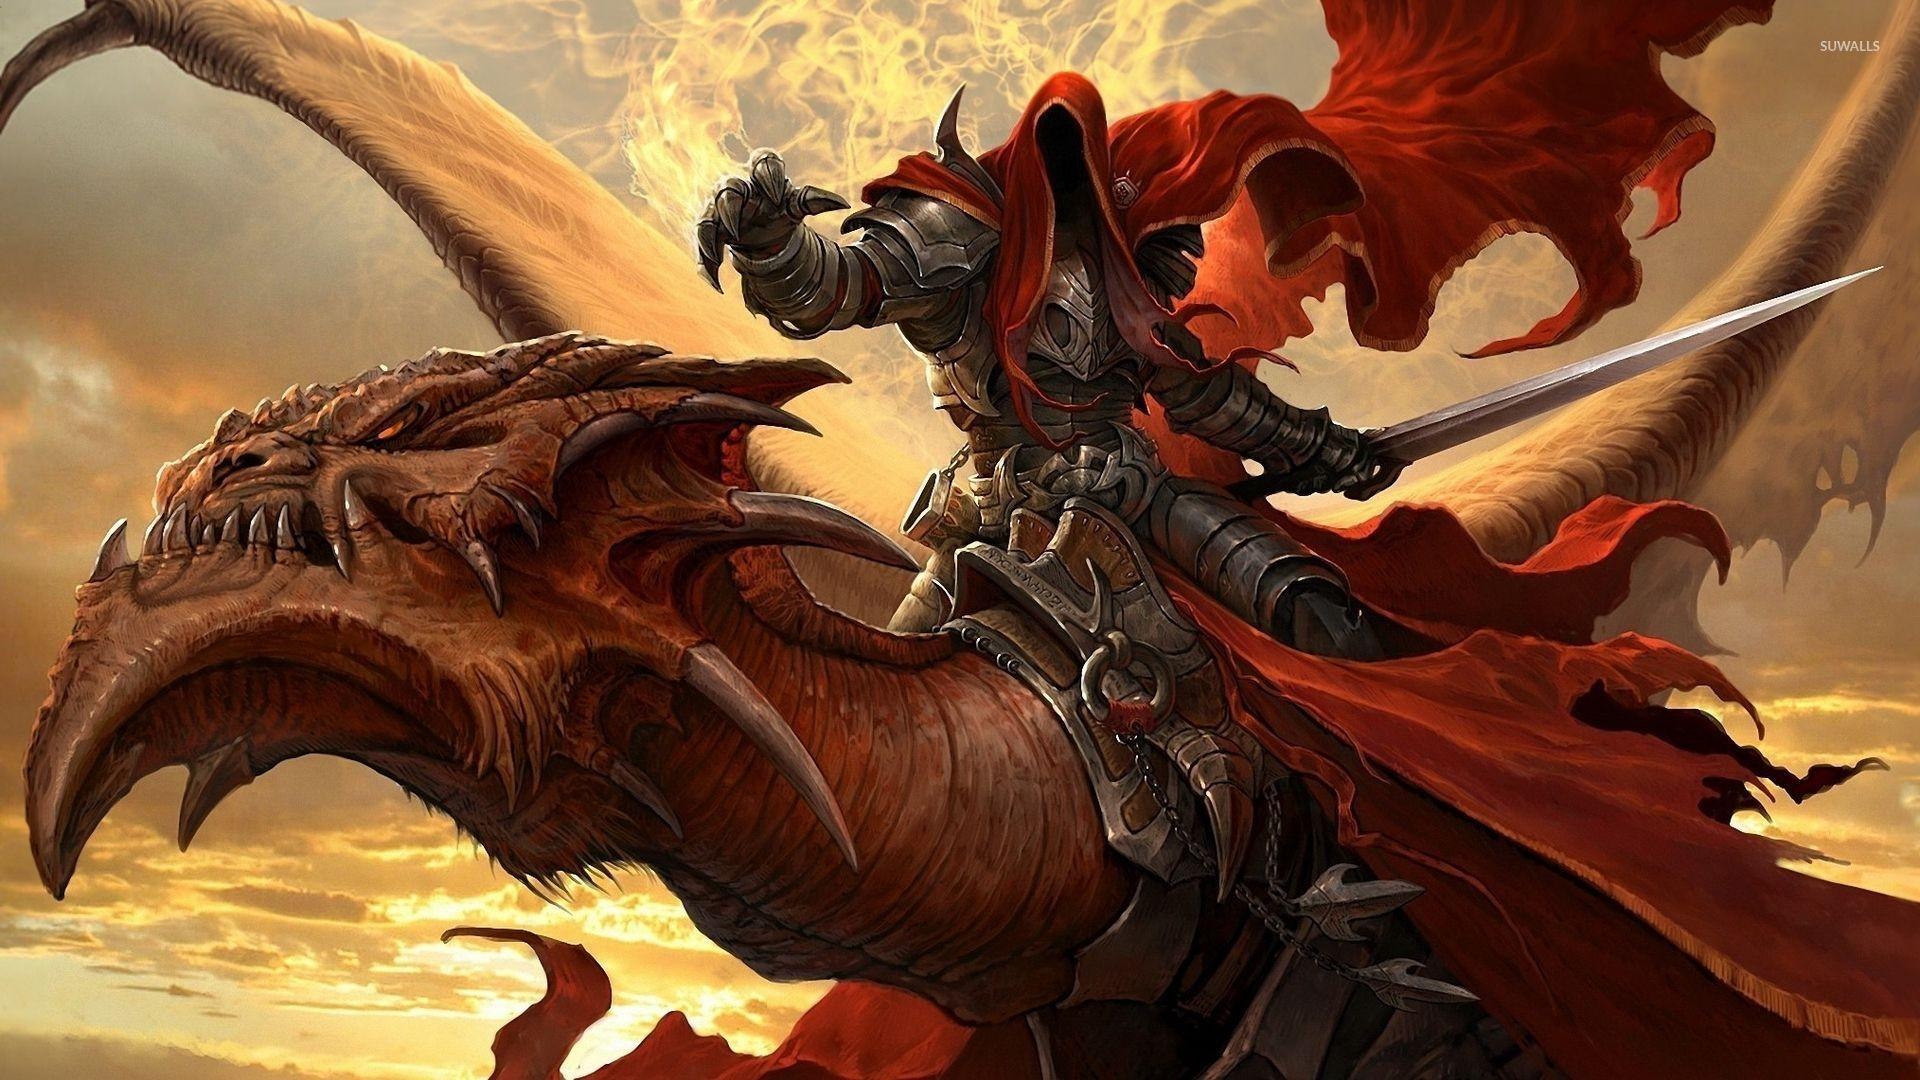 Warrior on the dragon wallpaper